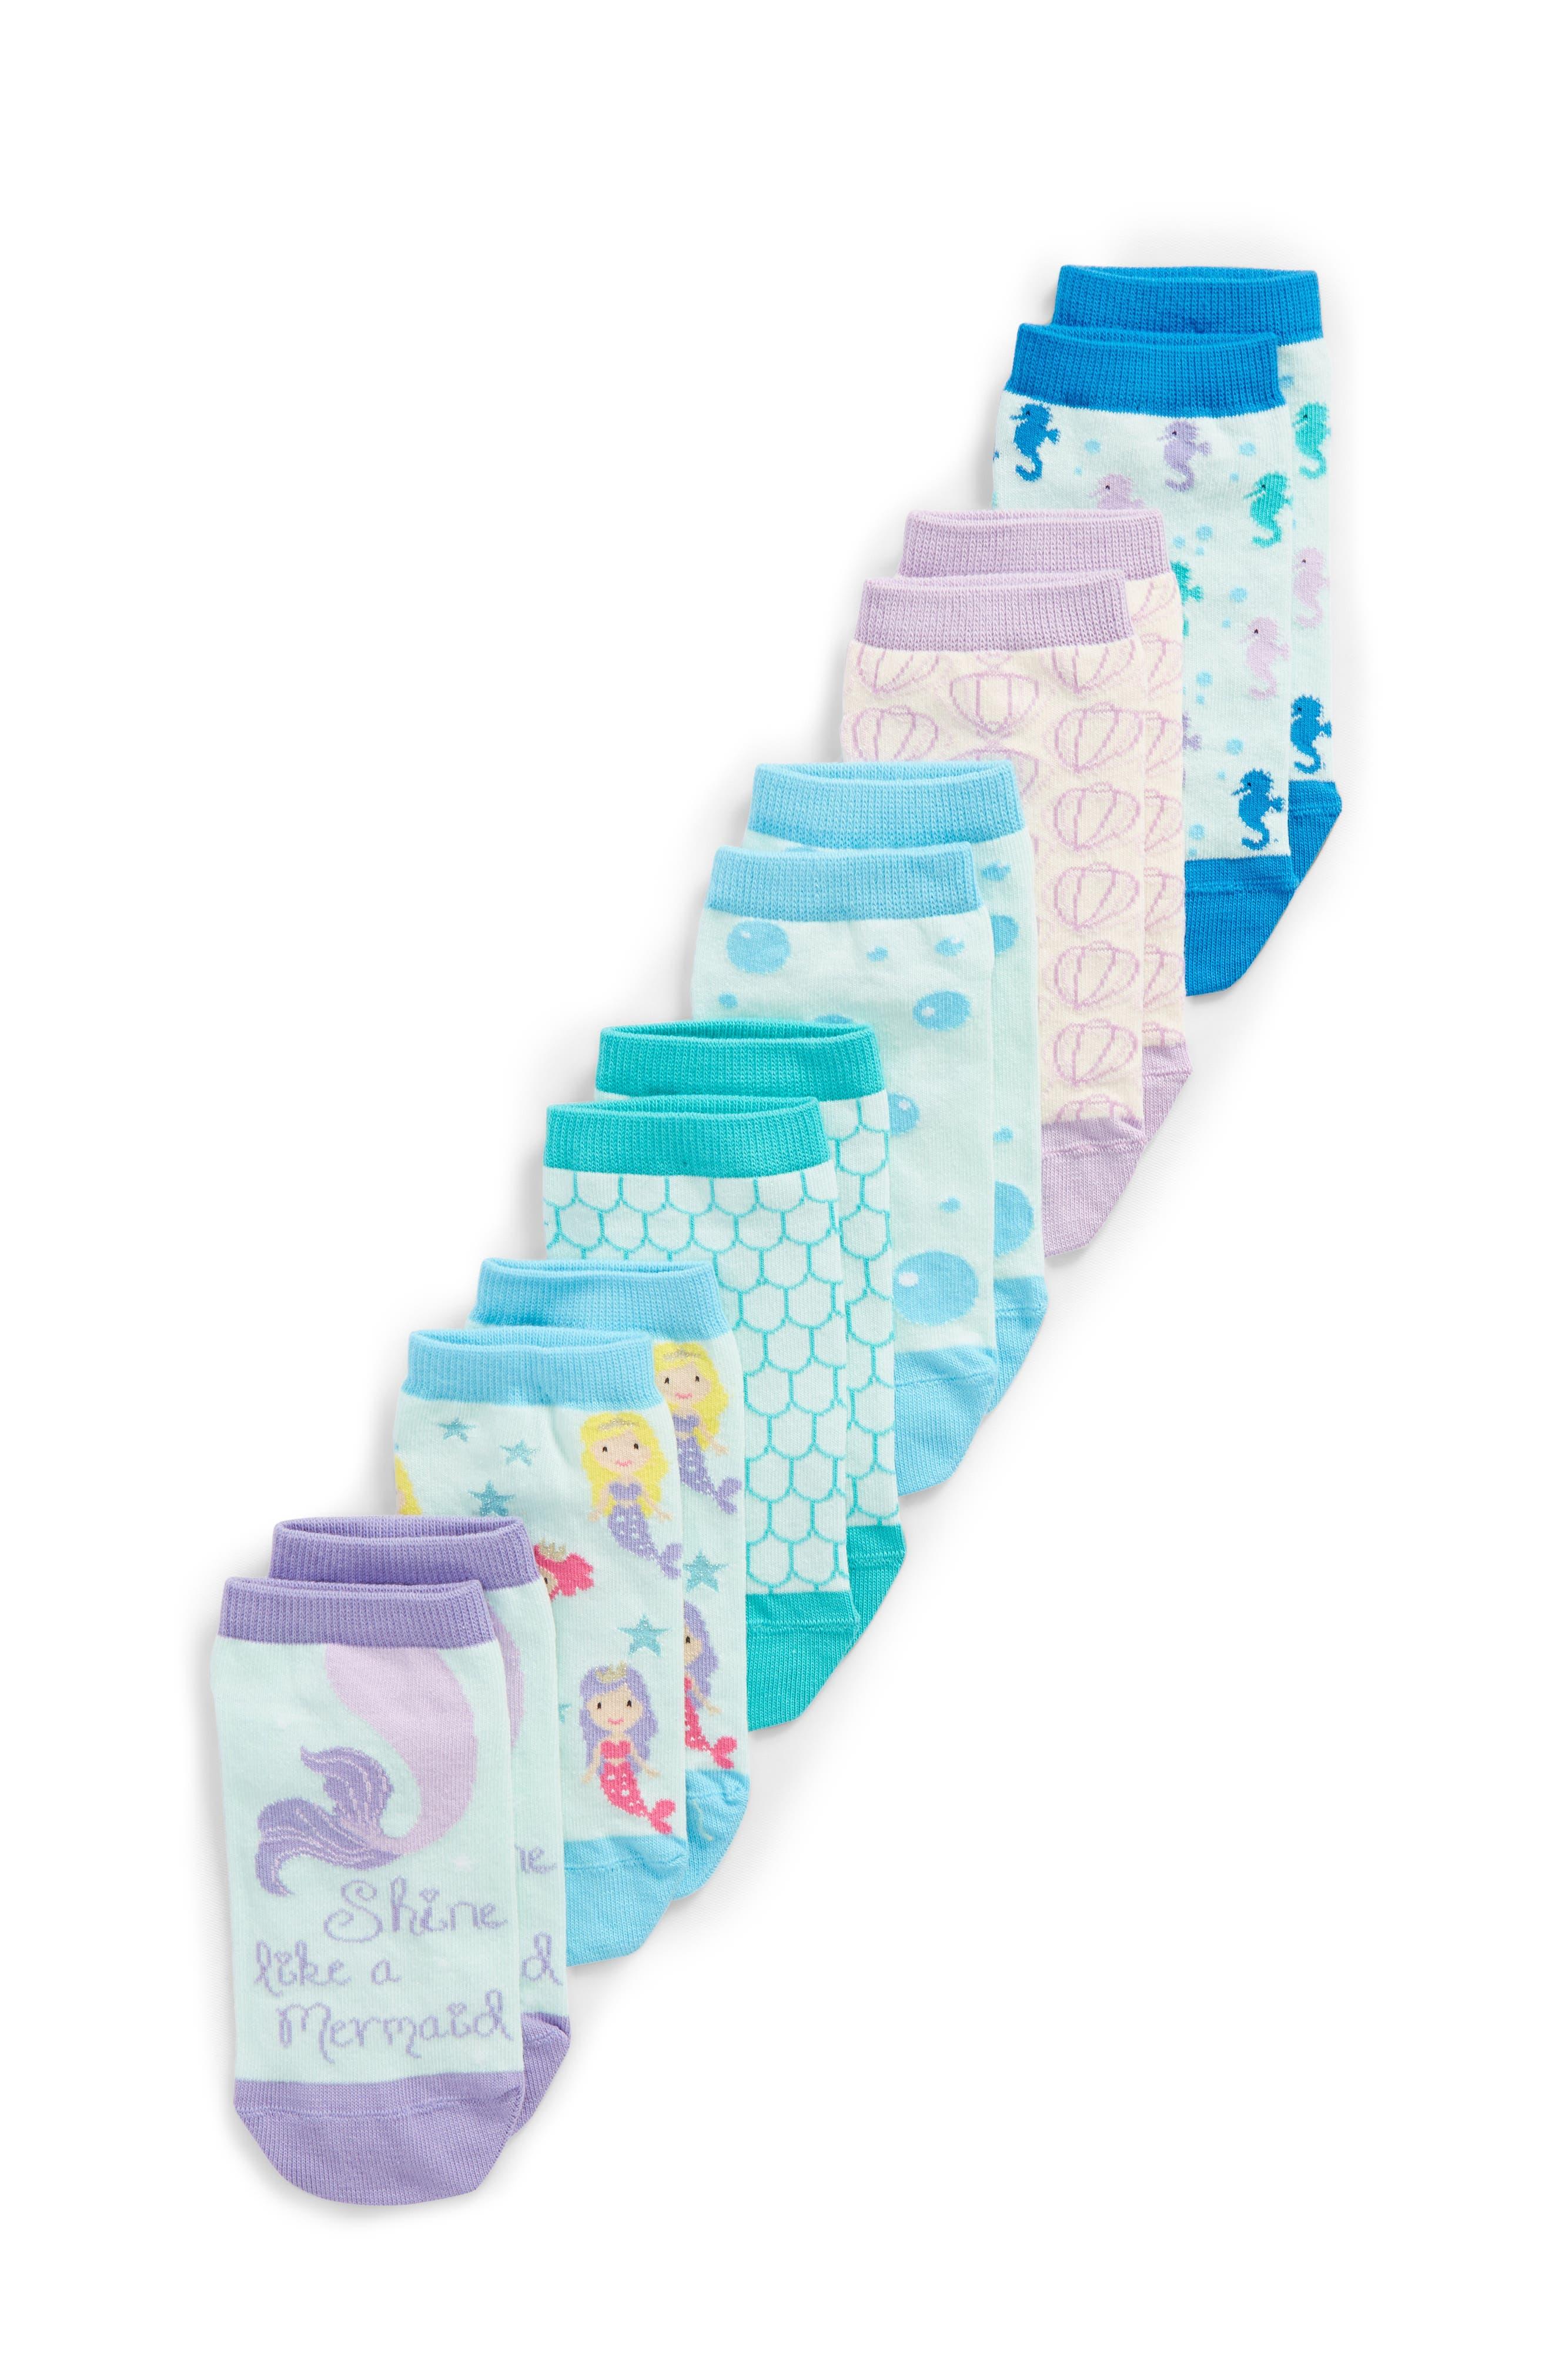 6-Pack Mermaid Low Cut Socks,                         Main,                         color, Blue Multi